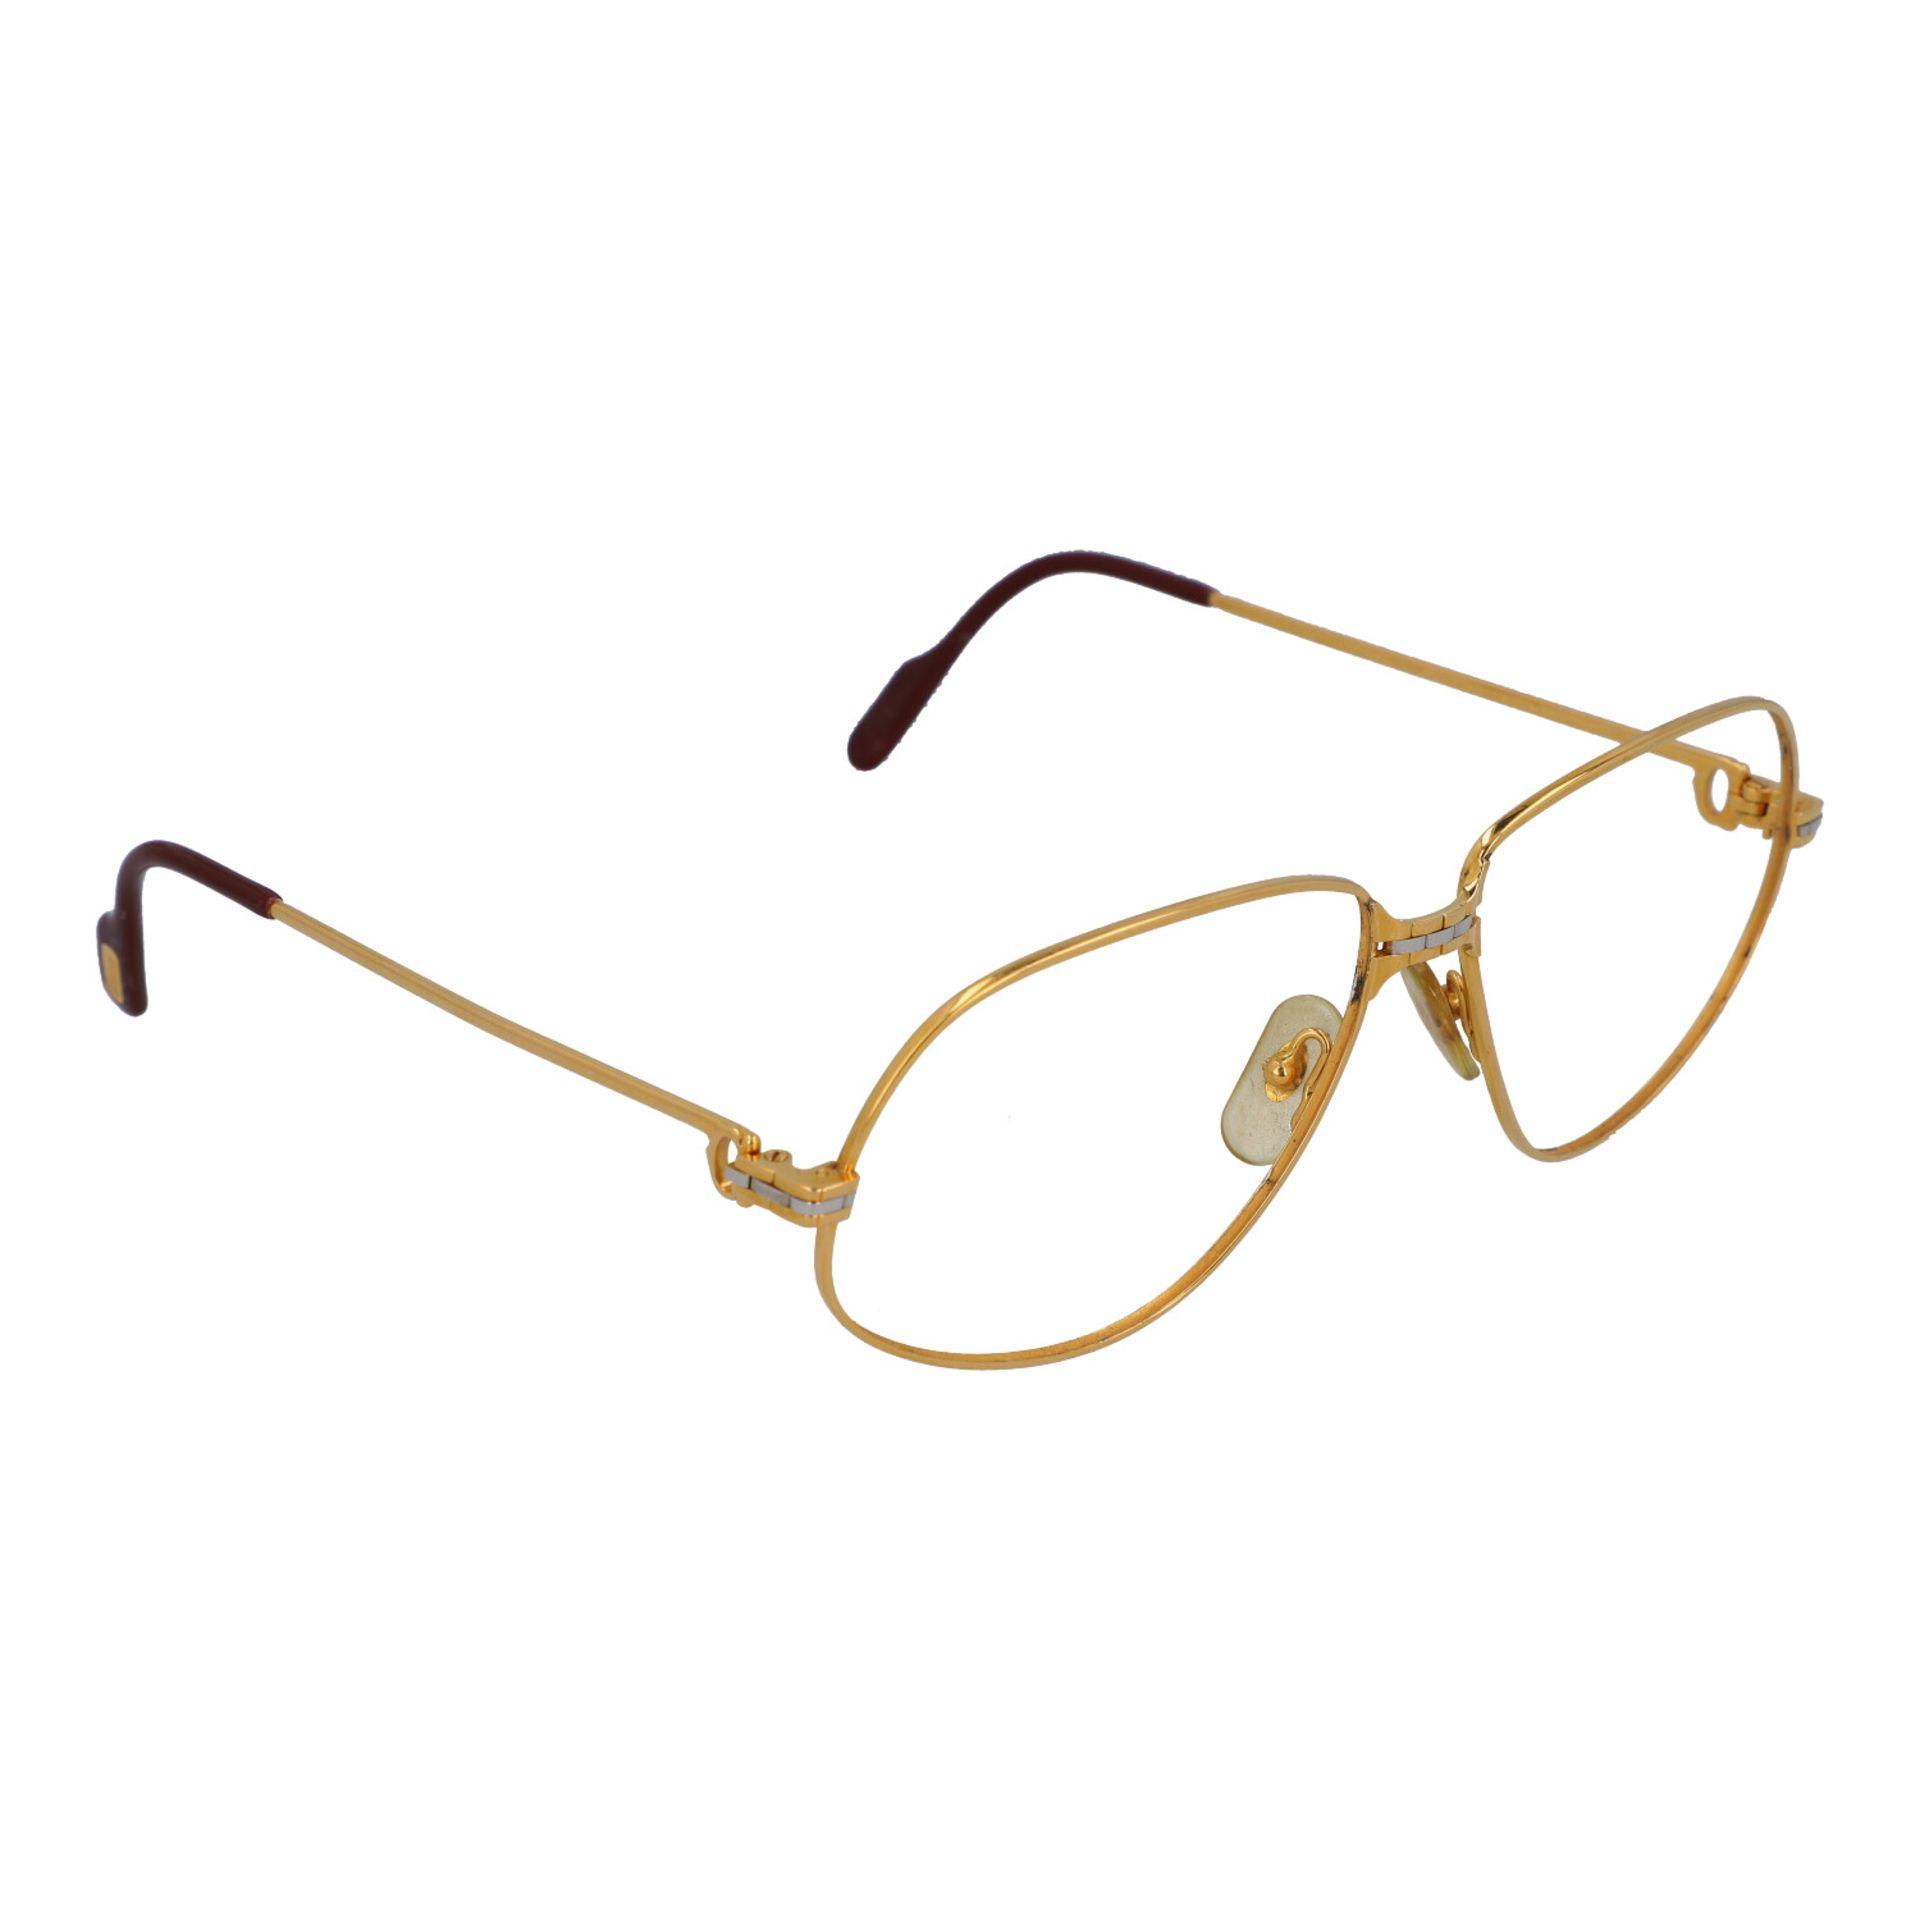 "CARTIER Brillengestell ""PANTHERE"", Koll.: 1988 in Paris. Vergoldetes Modell ohne Gläs - Image 2 of 4"